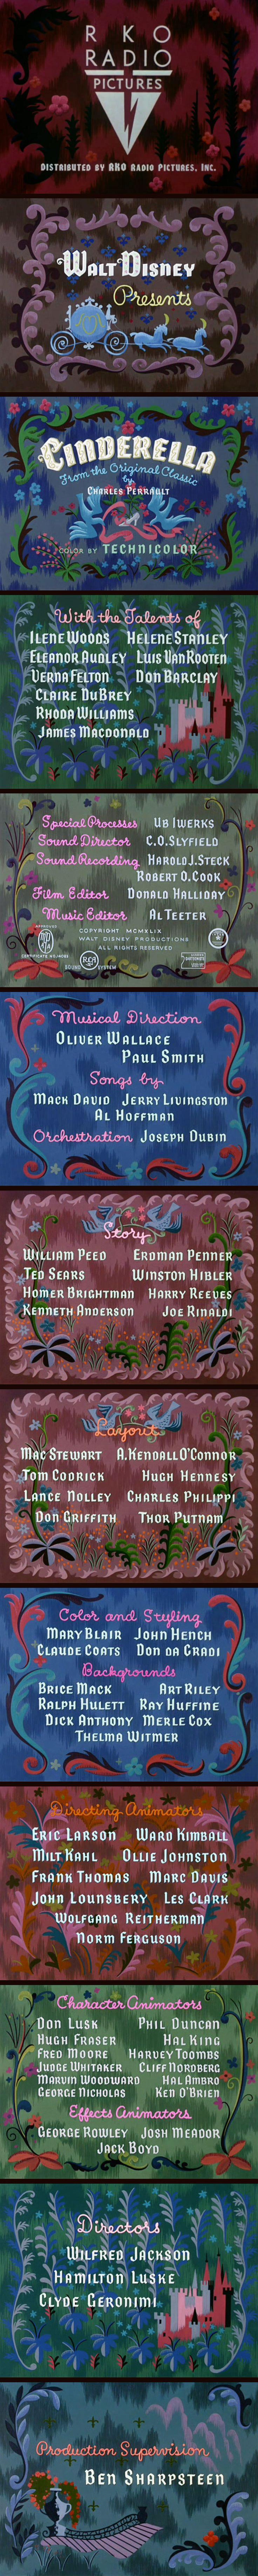 Walt Disney's Cinderella Title Credits by Mary Blair